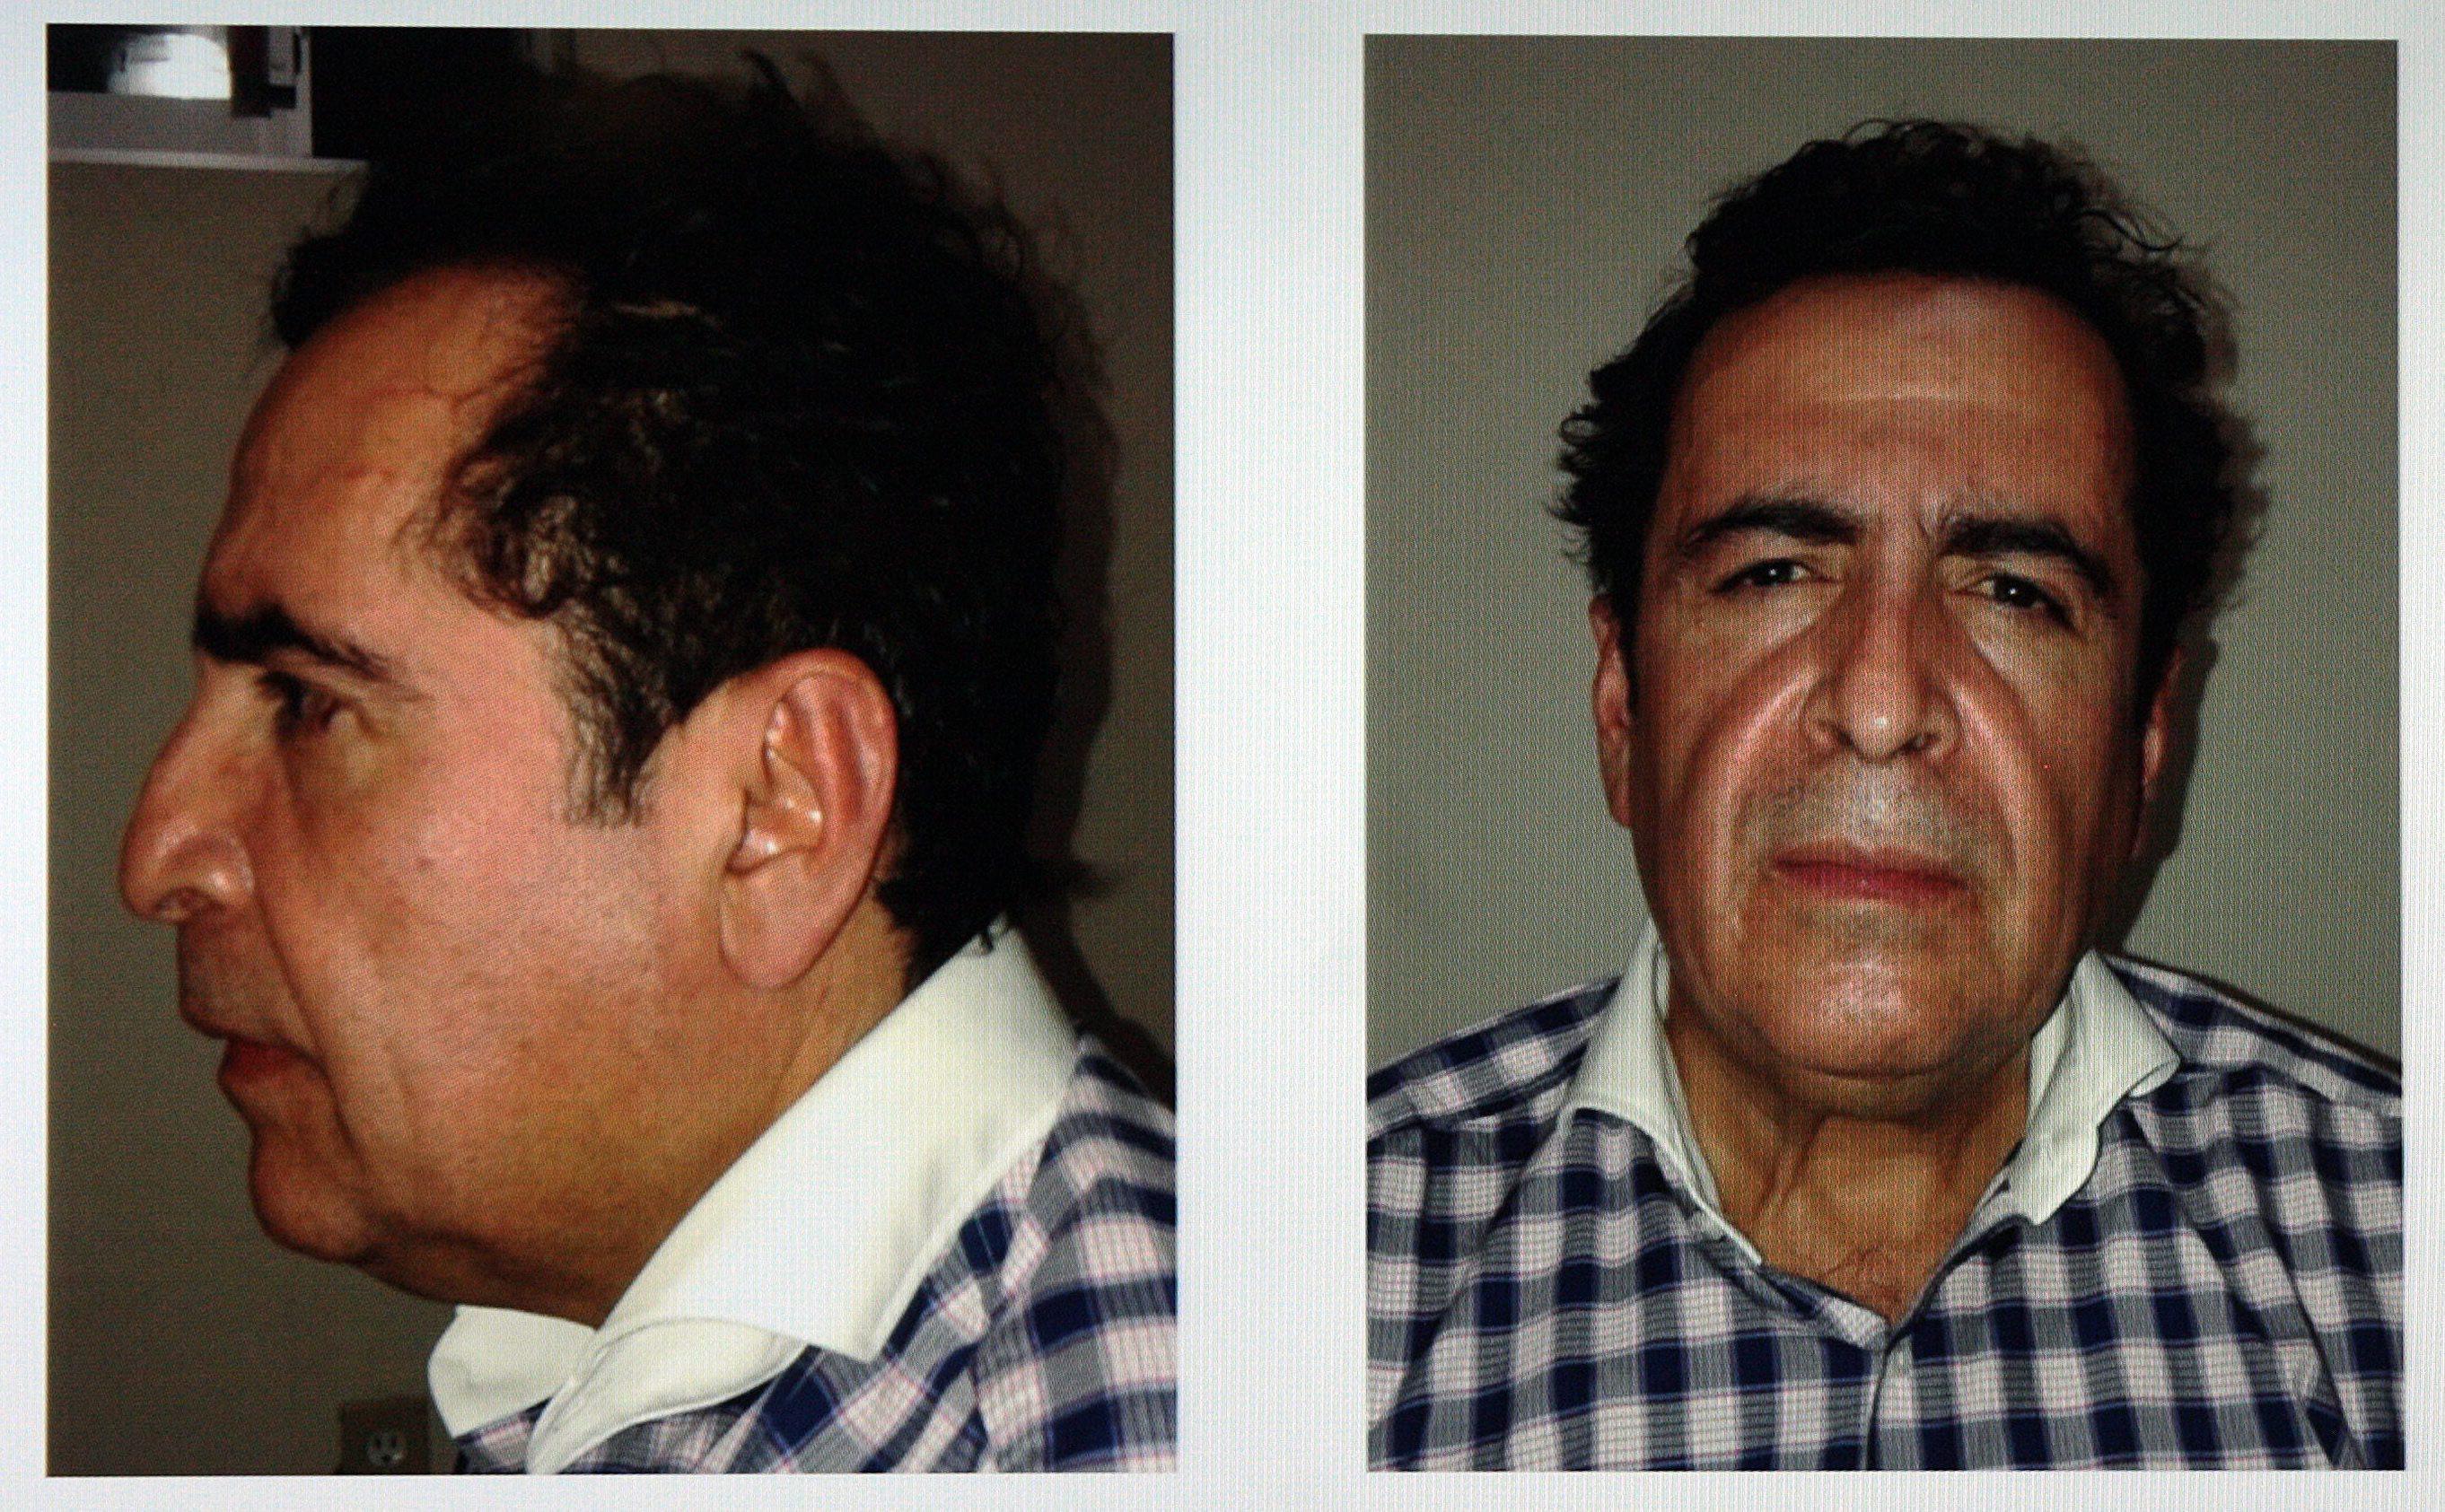 Morreu antigo barão da droga mexicano Hector Beltran Leyva